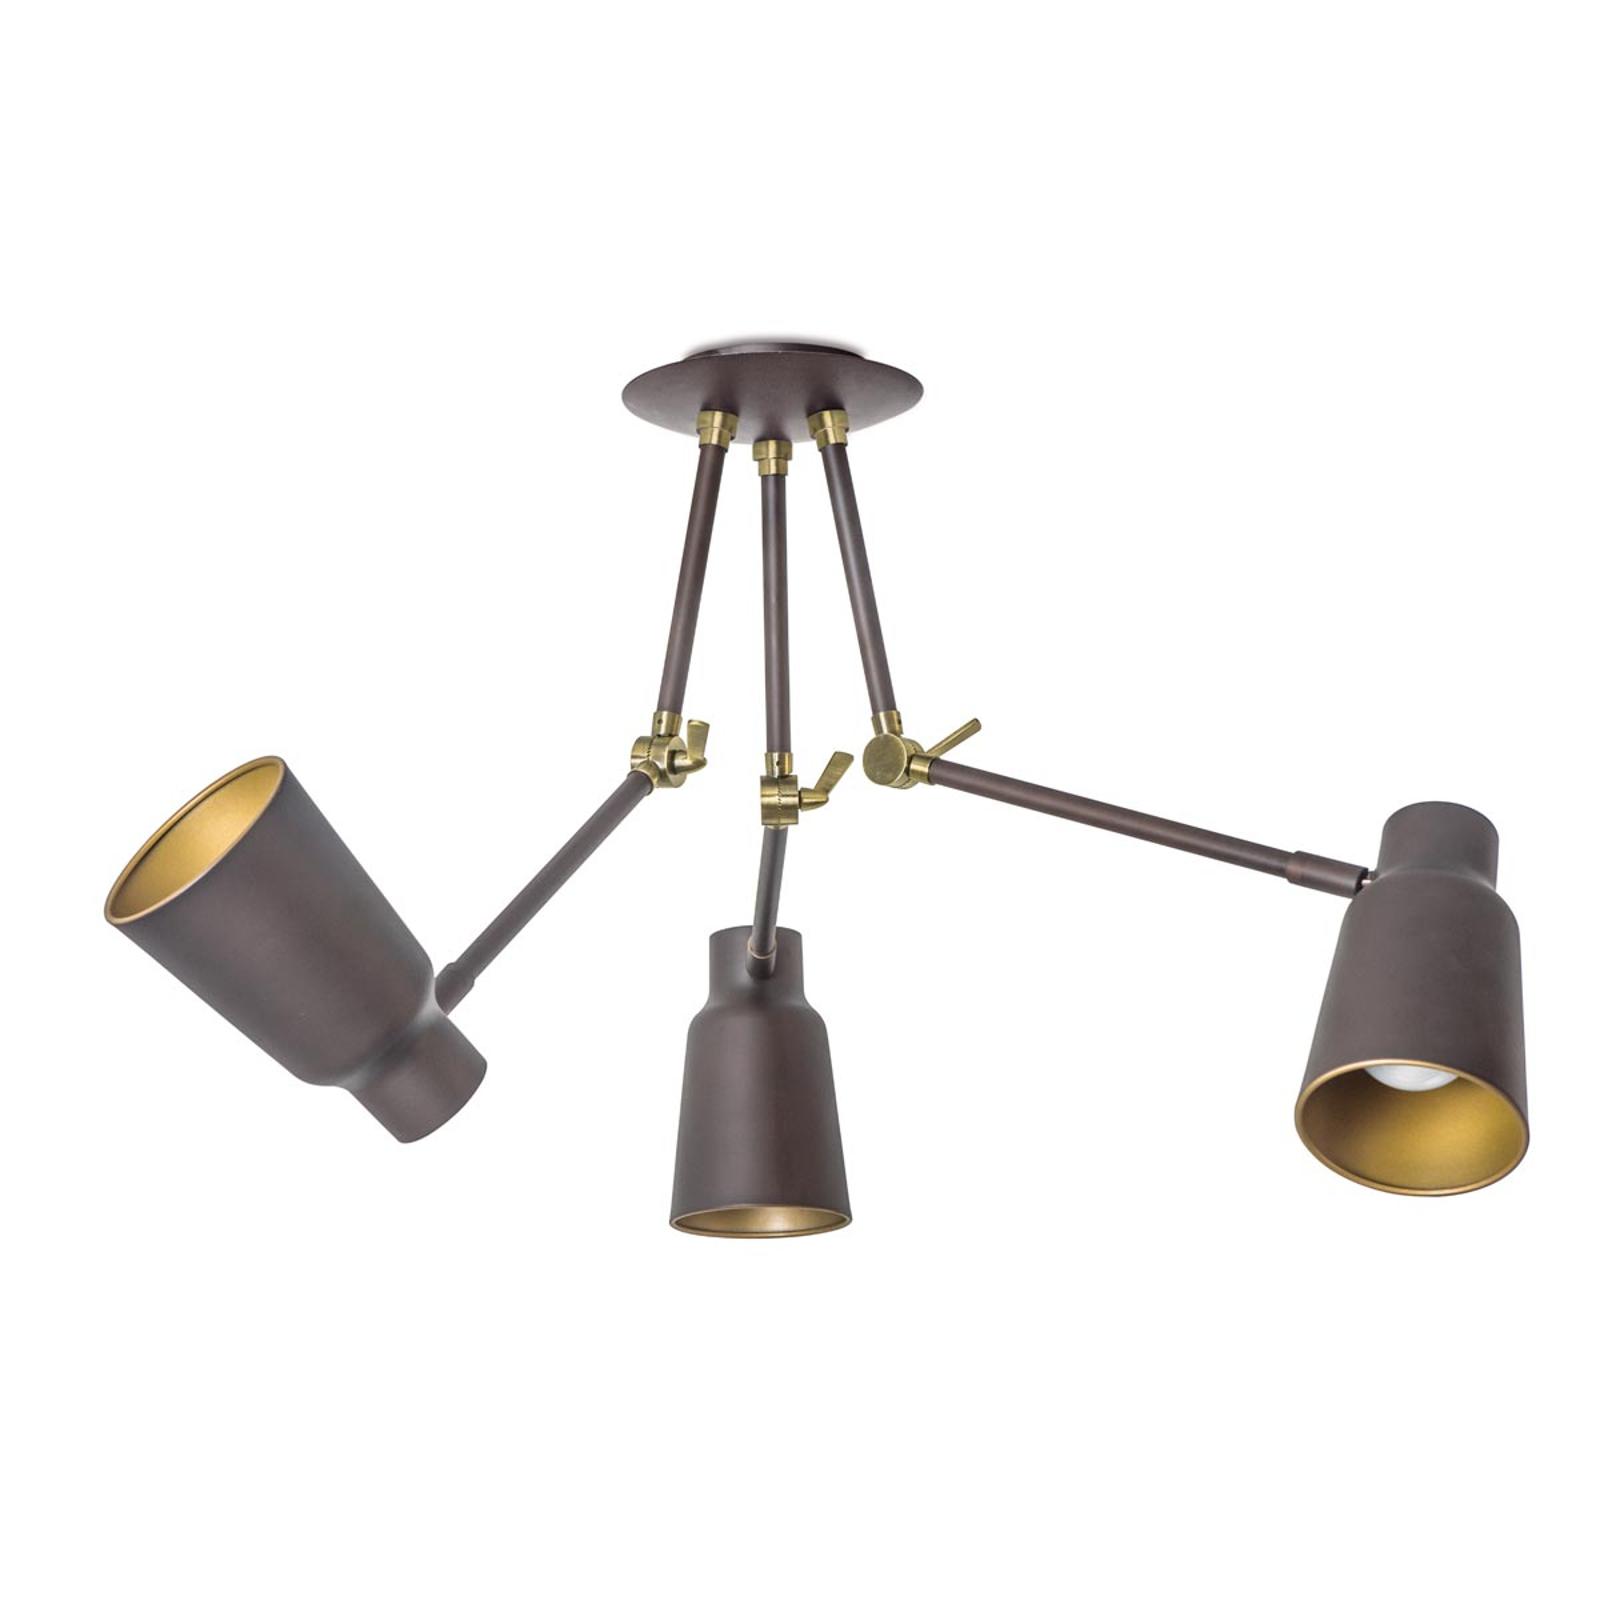 Trójramienna lampa sufitowa Funk